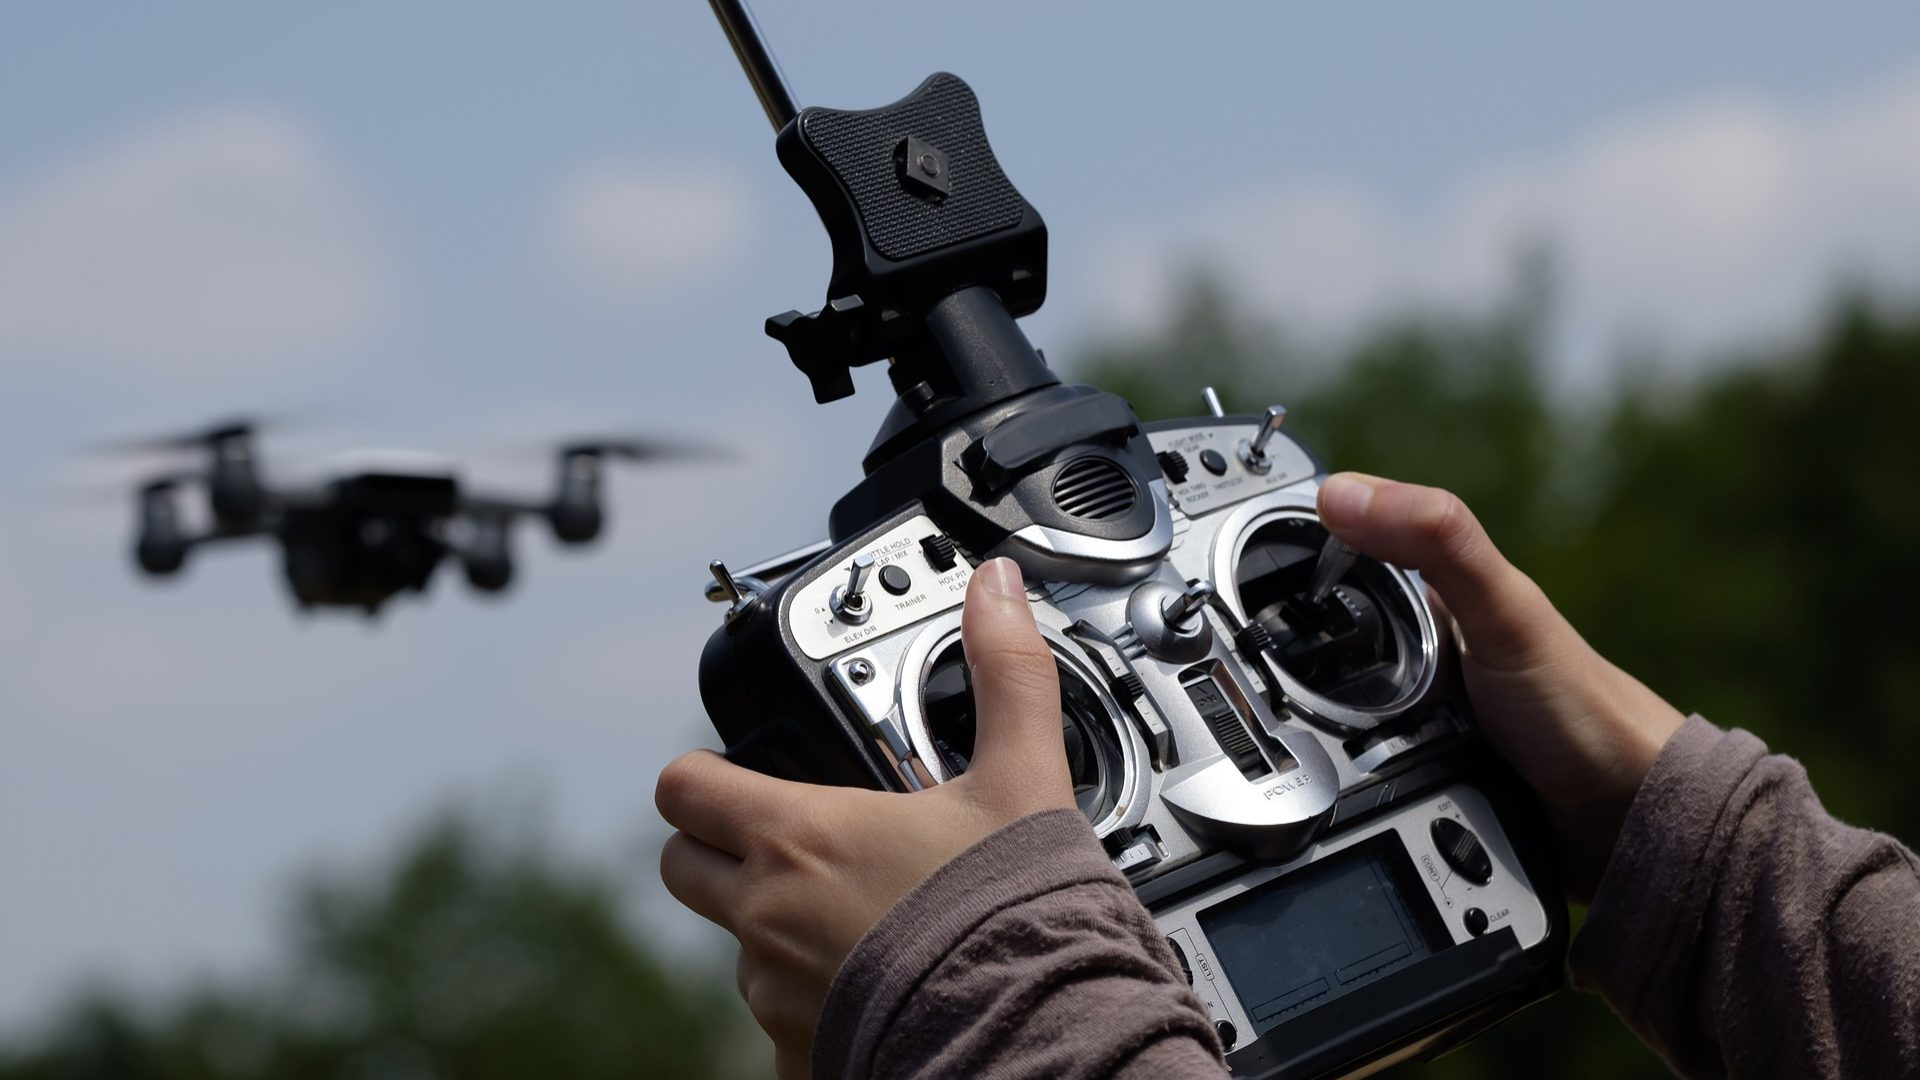 Registo nacional de drones arranca em 2020